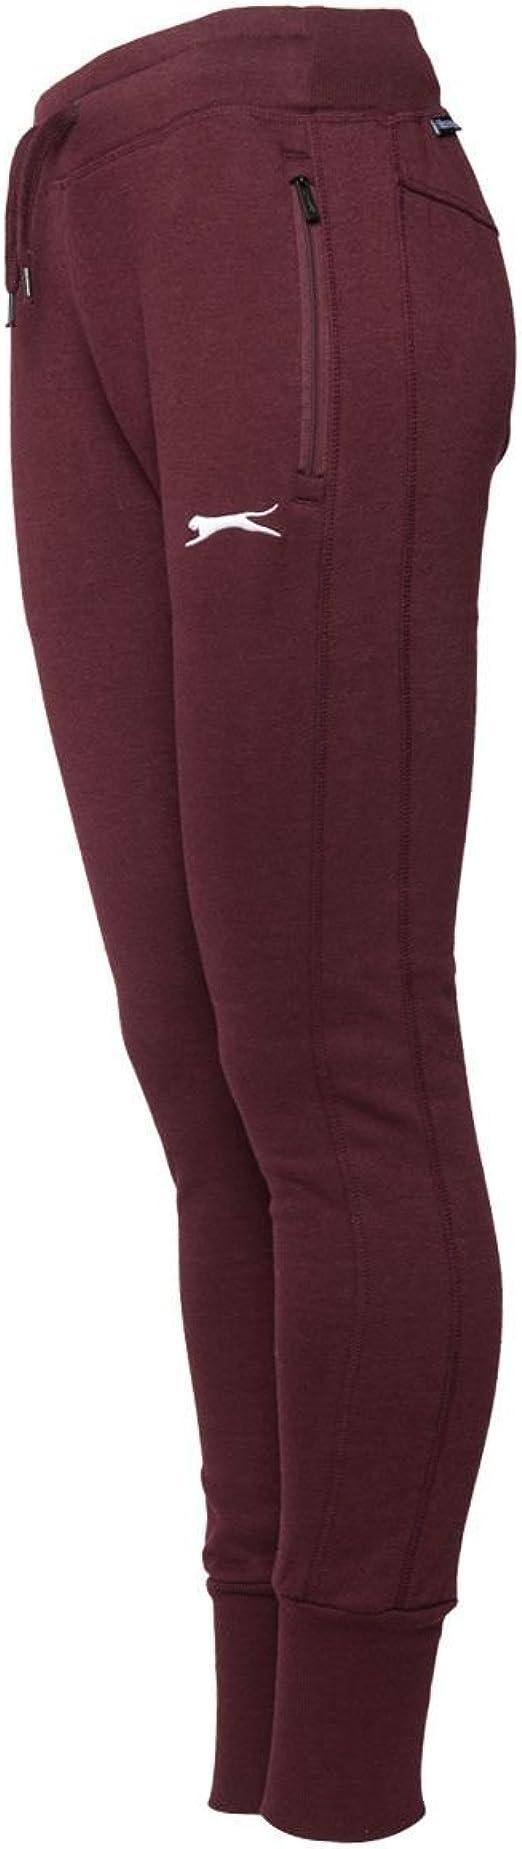 Slazenger - Pantalón Deportivo - para Mujer Rojo Ciruela 38 ...